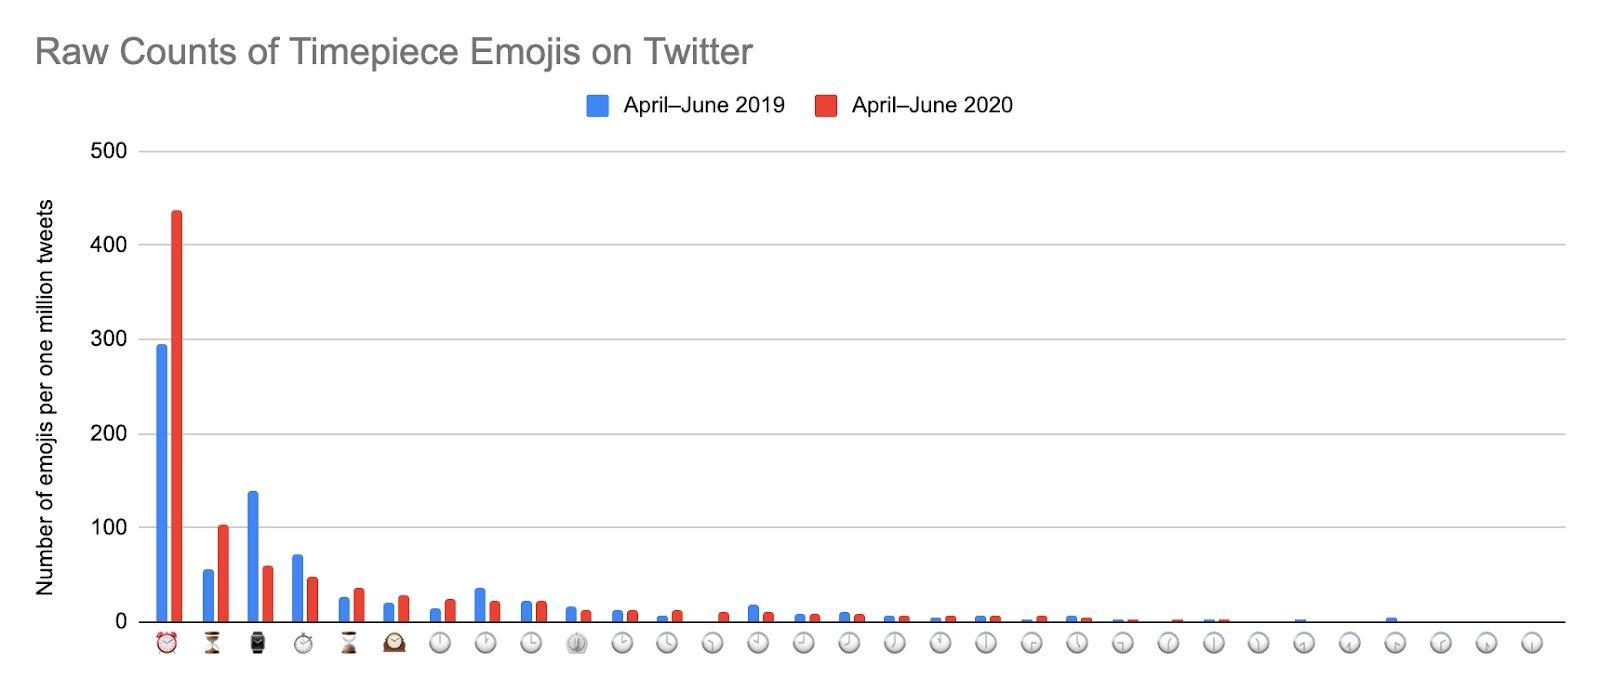 raw-counts-emoji-timepieces-twitter-emojipedia-2019-2020